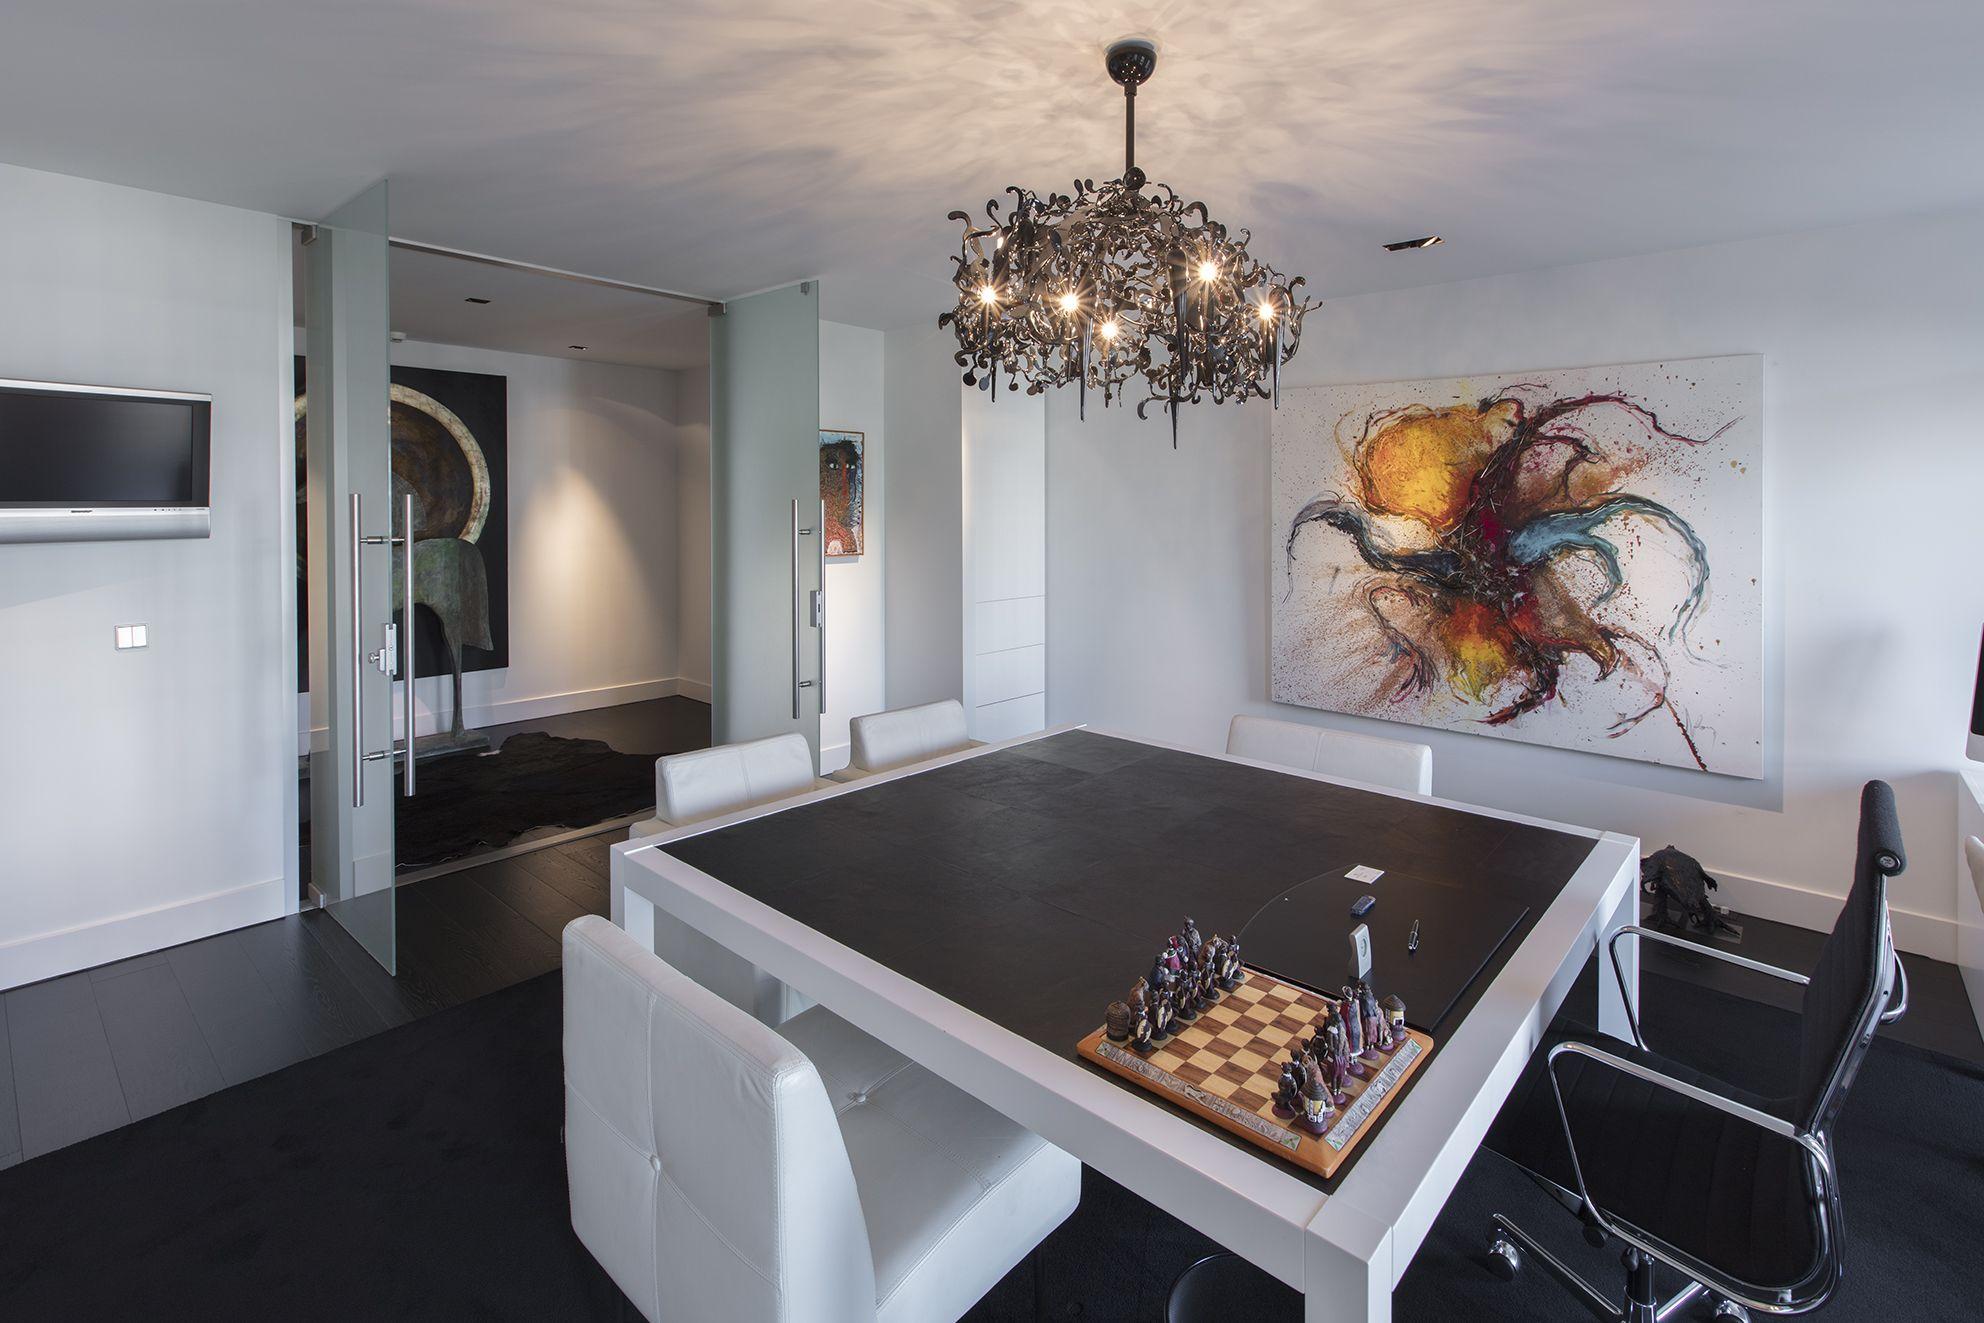 Penthouse Jan des Bouvrie 2 ‹ Interieurfotograaf | Fotograaf ...